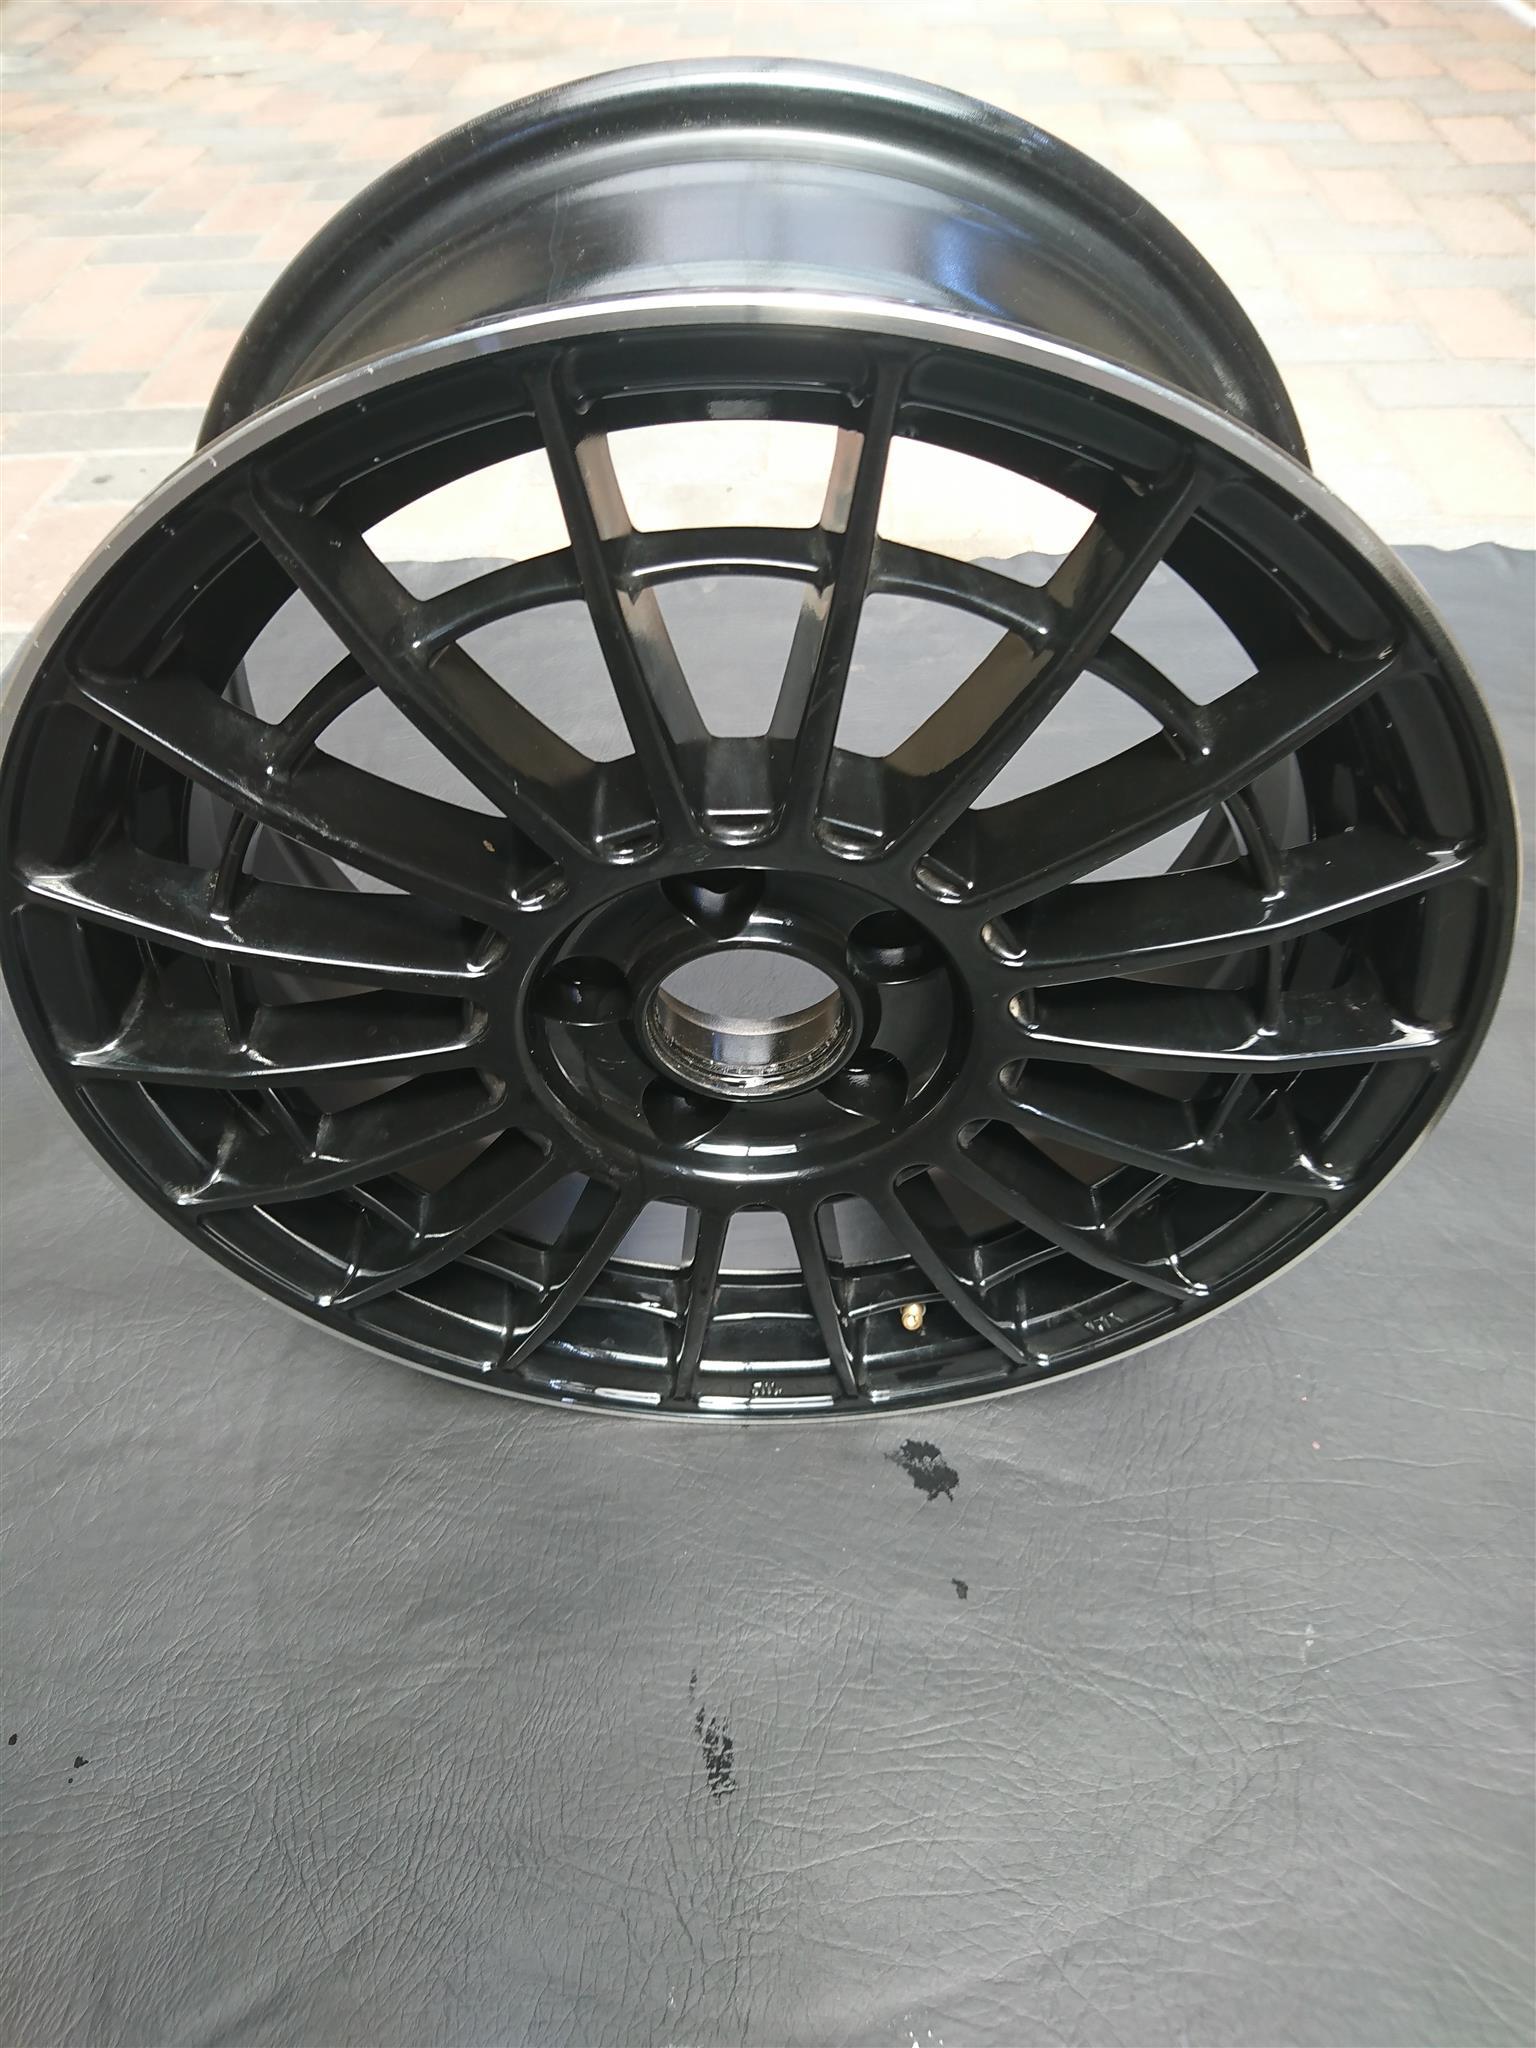 15 Inch Sparewheel For Sale-Pcd-5x100